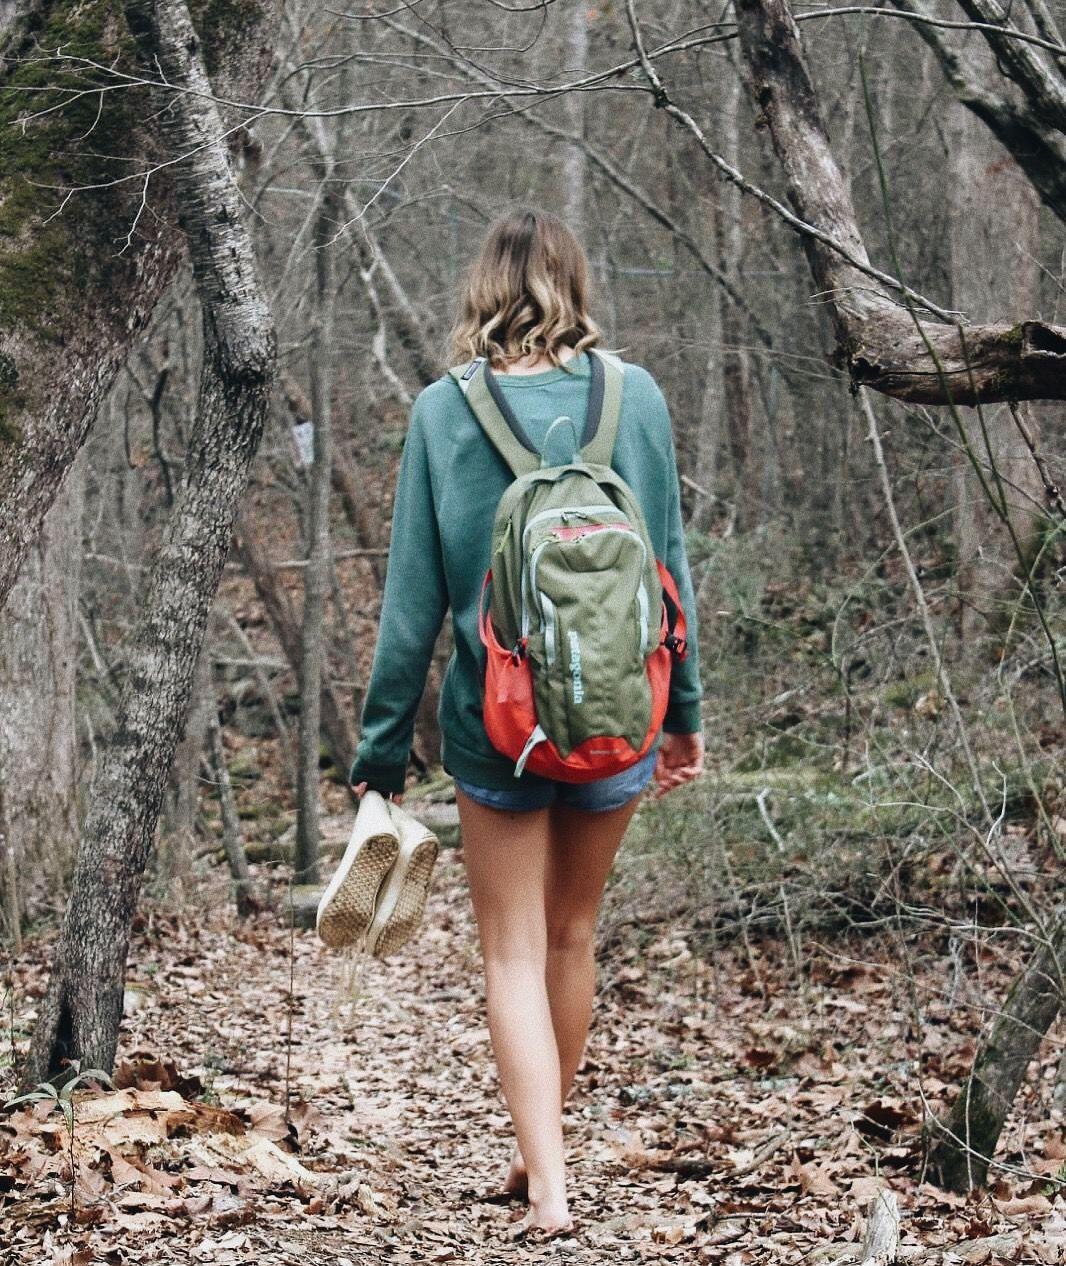 Barefoot Hiking Girls